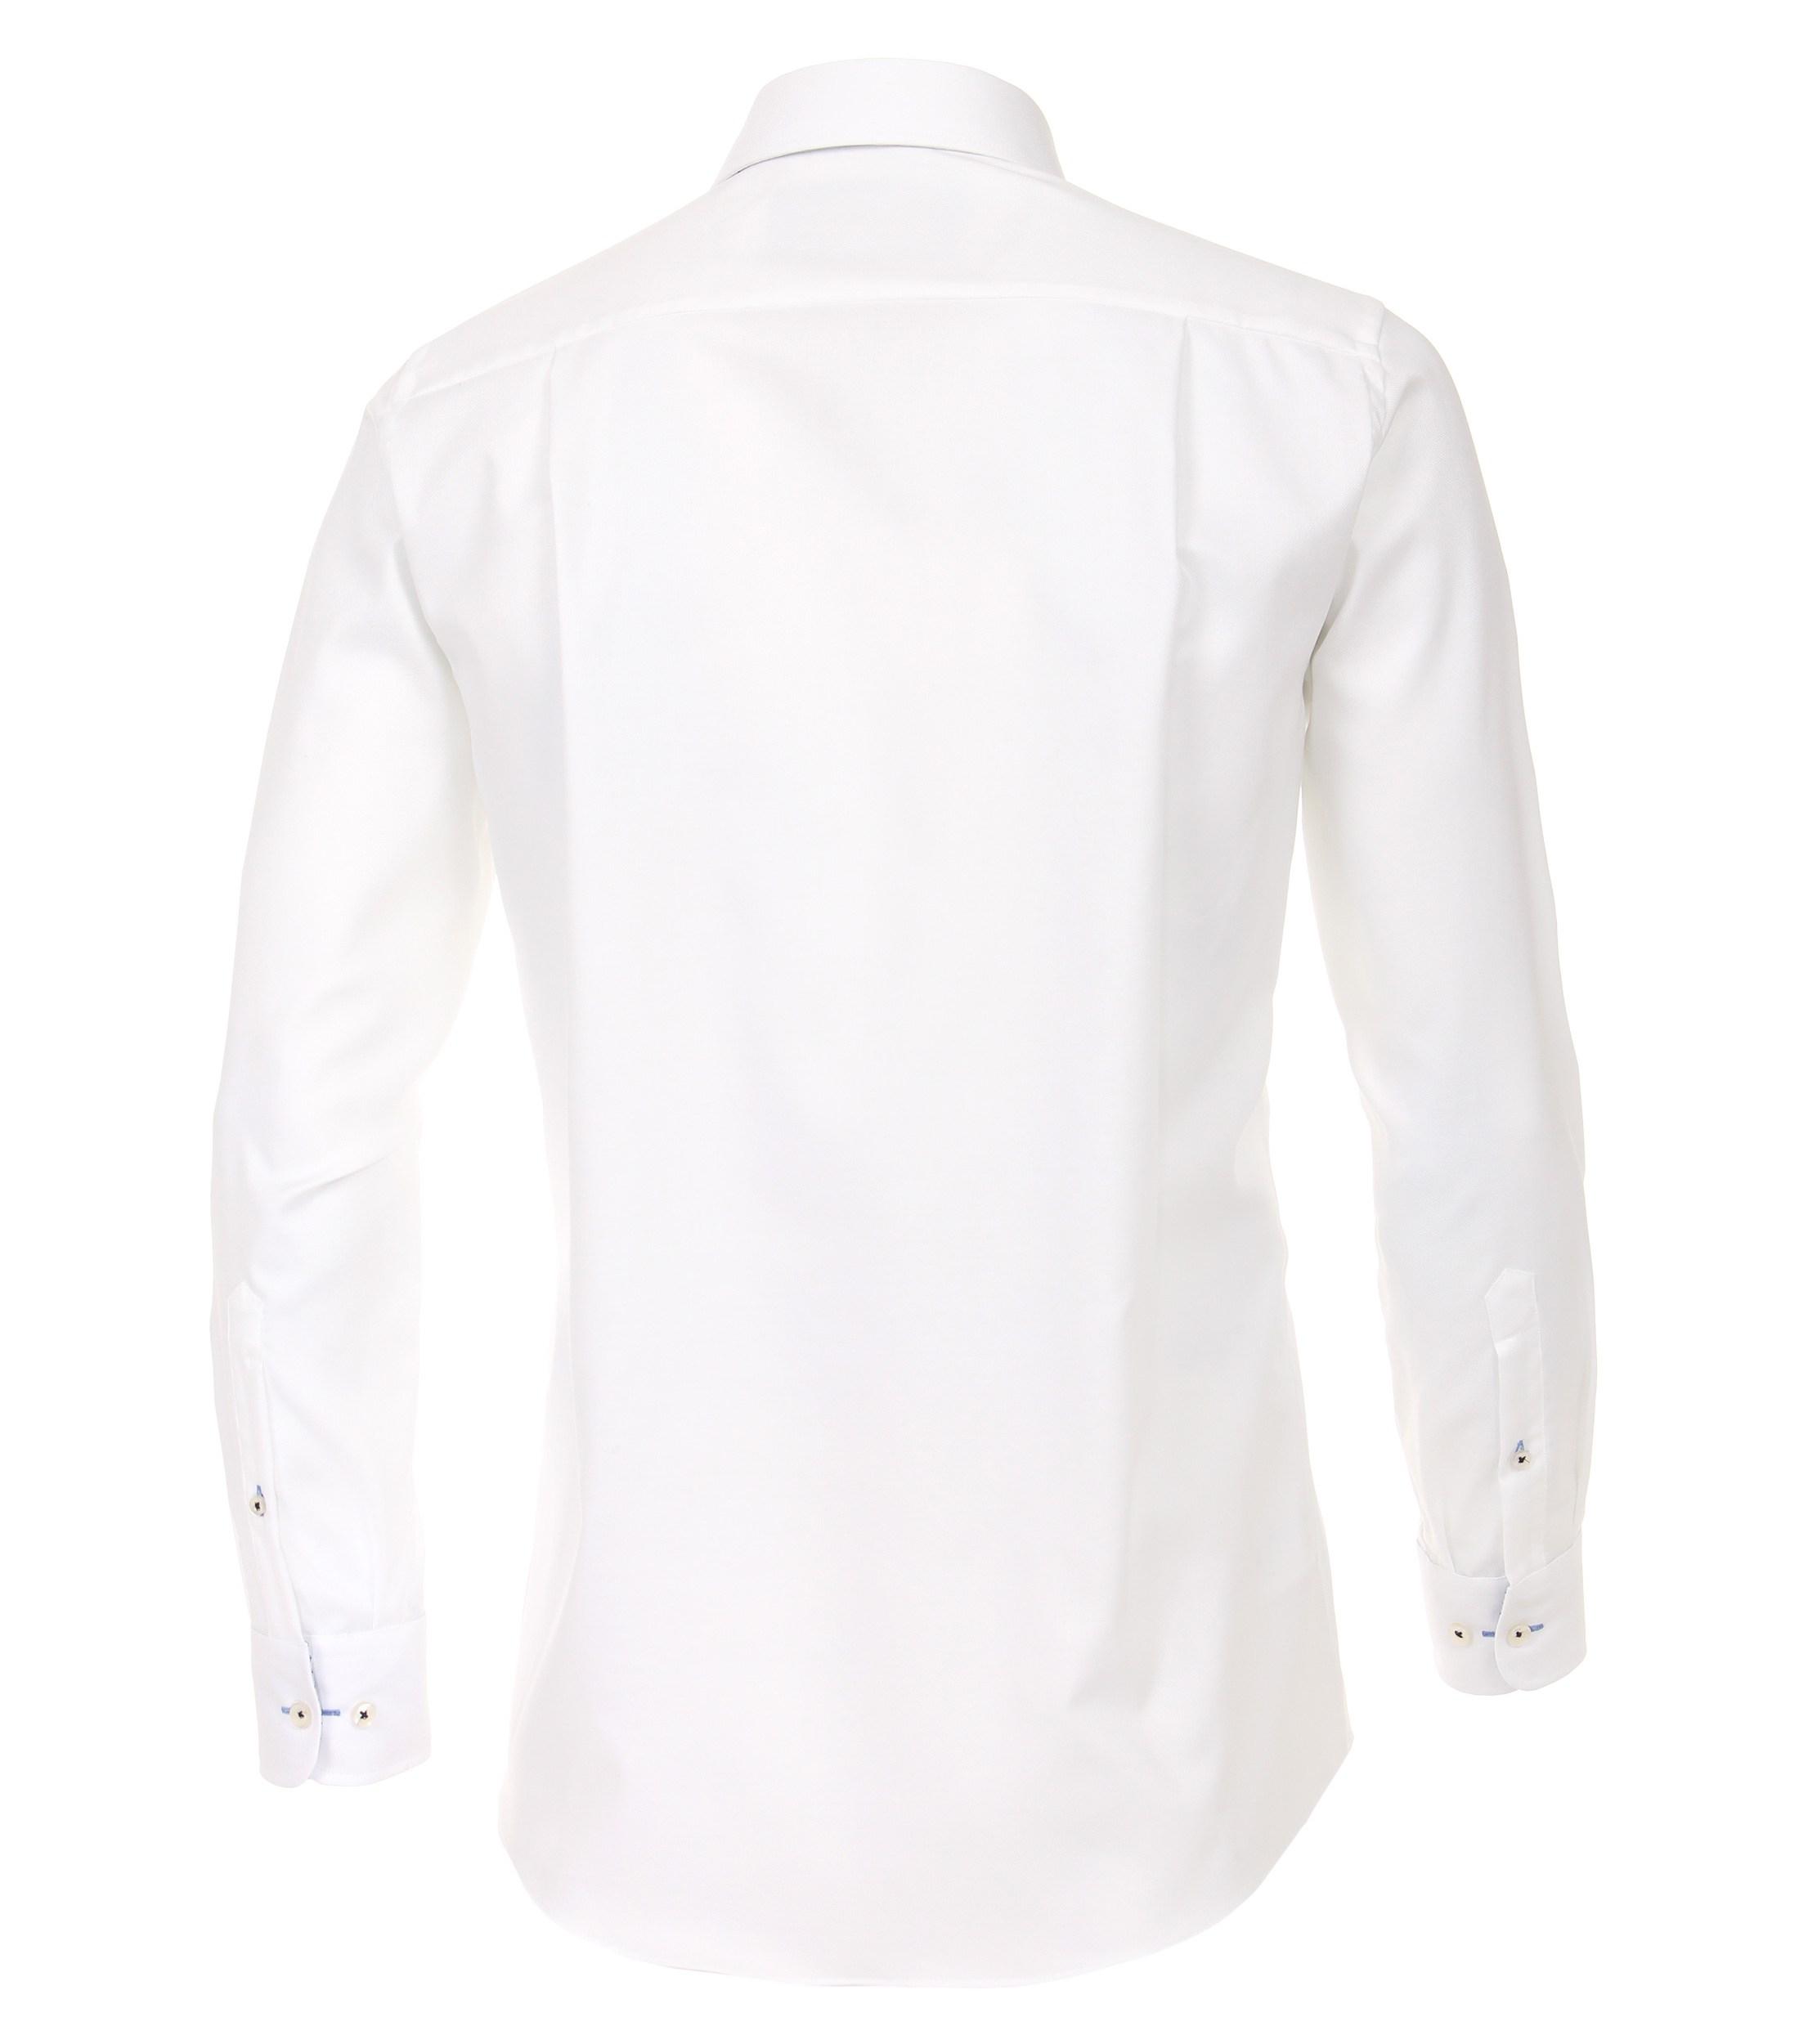 Casa Moda Spec. Edition Kent overhemd LM, wit